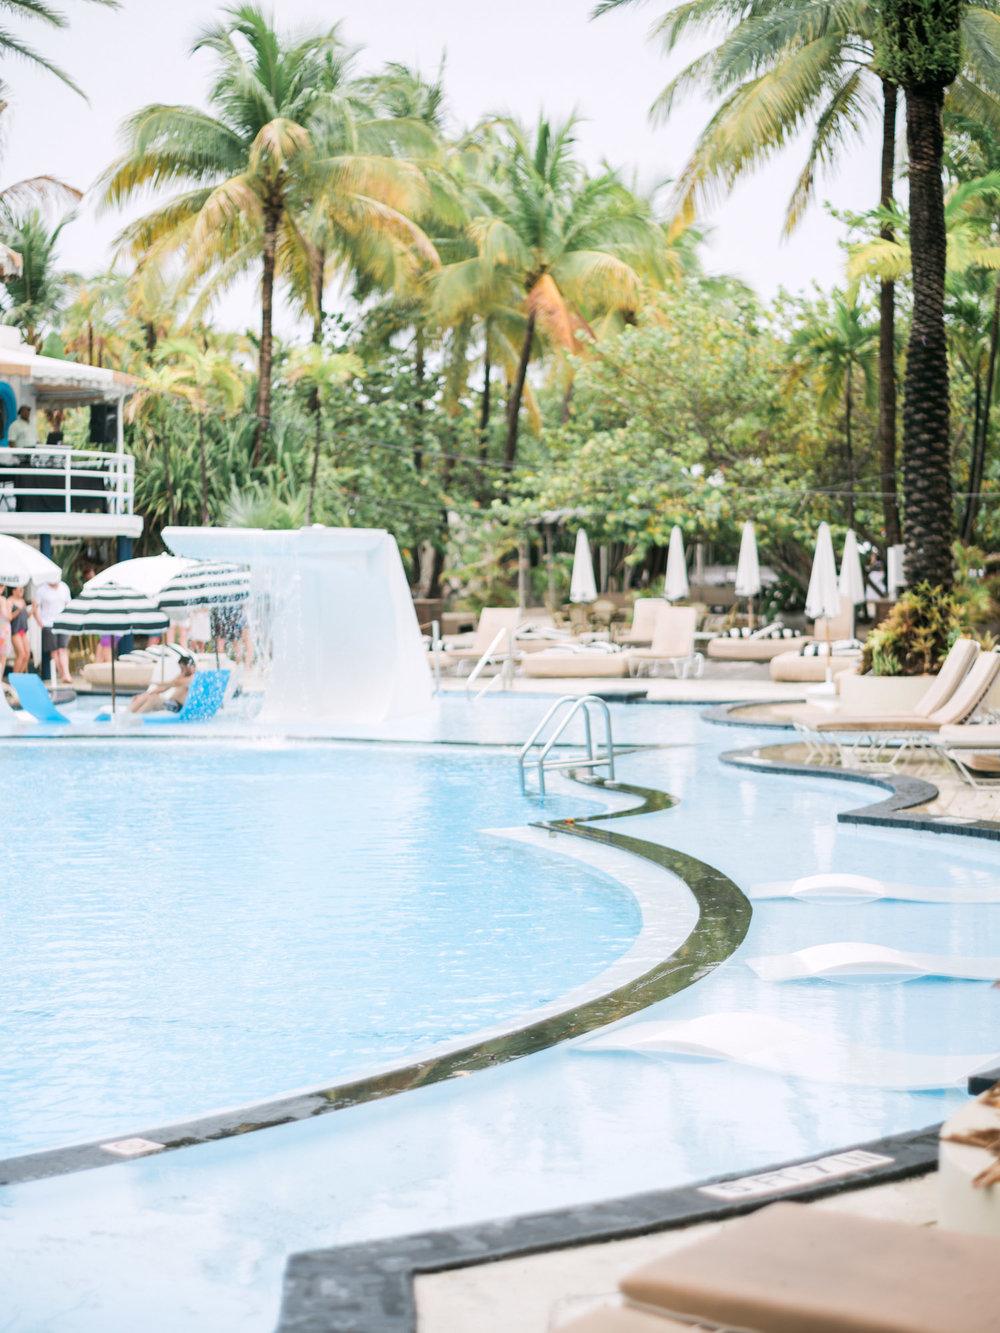 raleigh-miami-beach-destination-film-wedding-0288.jpg